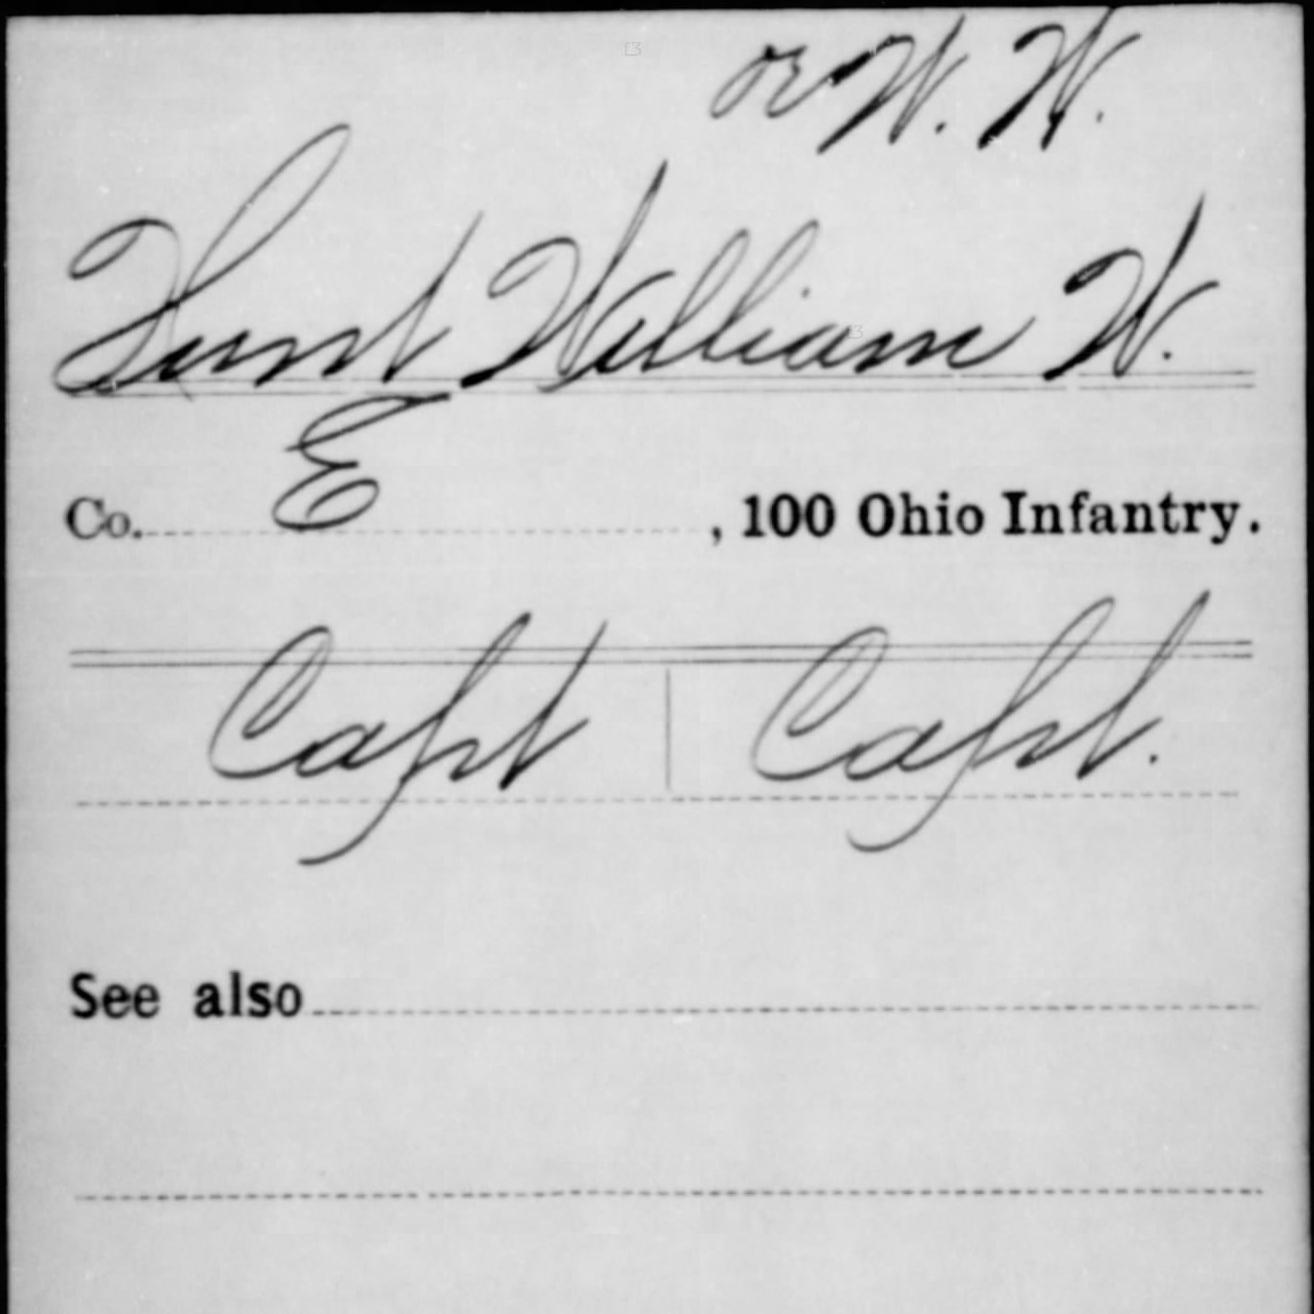 Capt. William Hunt, Co. E, 100th OH Infantry, USA